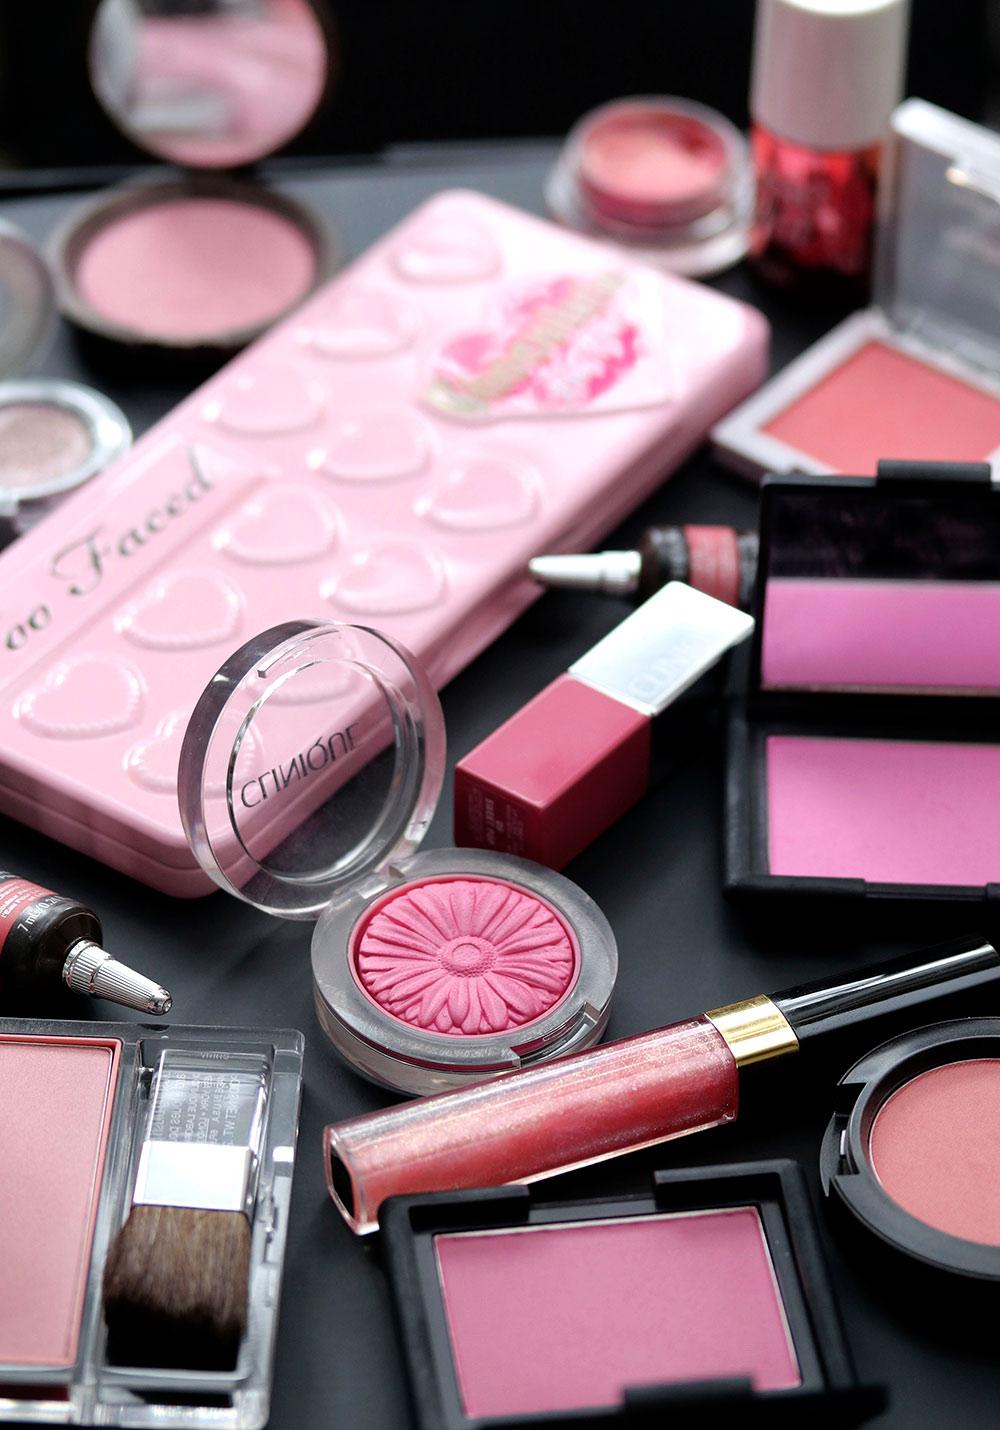 pink makeup monday poll august 6